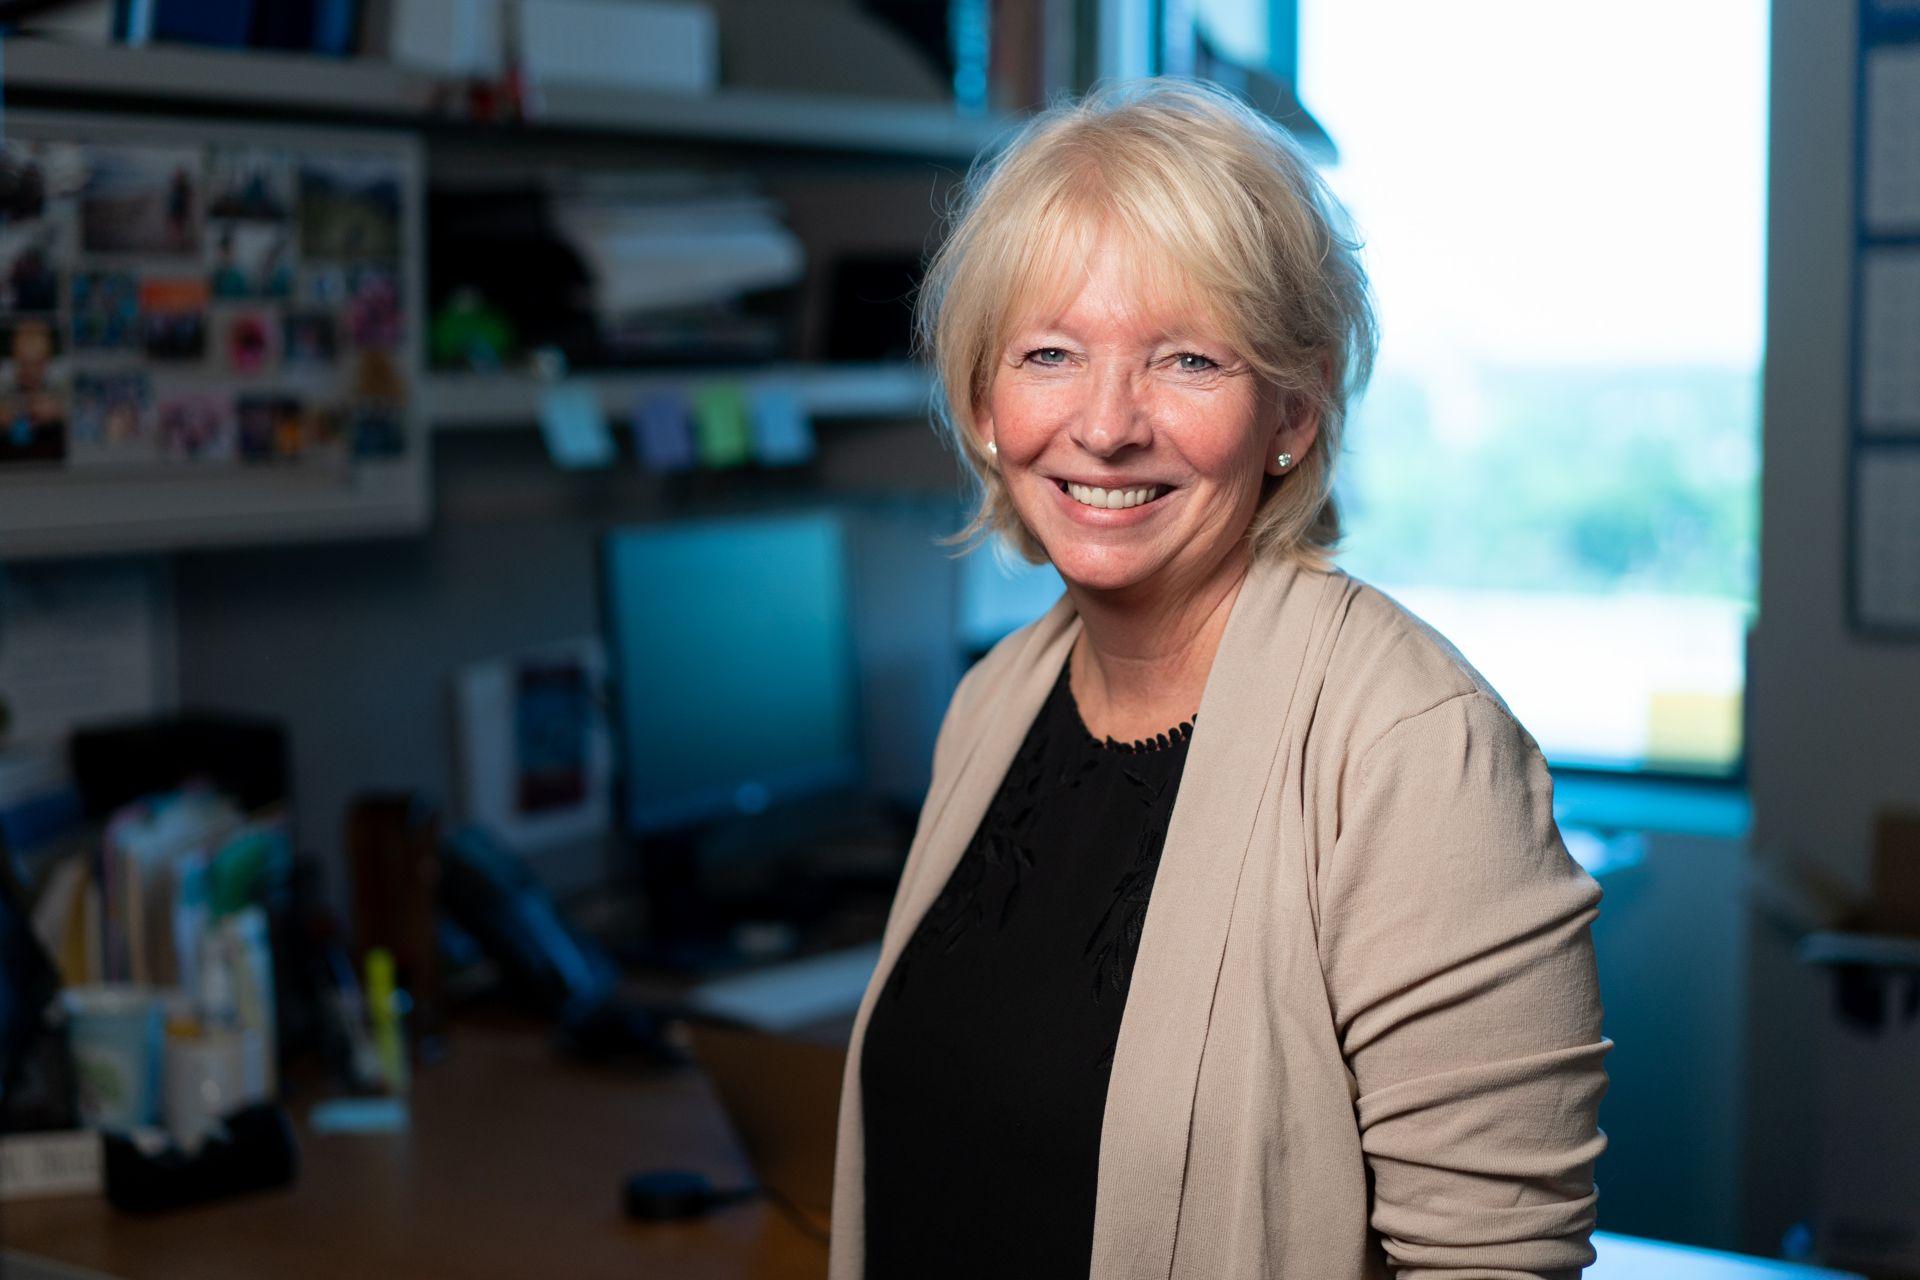 Pamela McKenzie, PhD